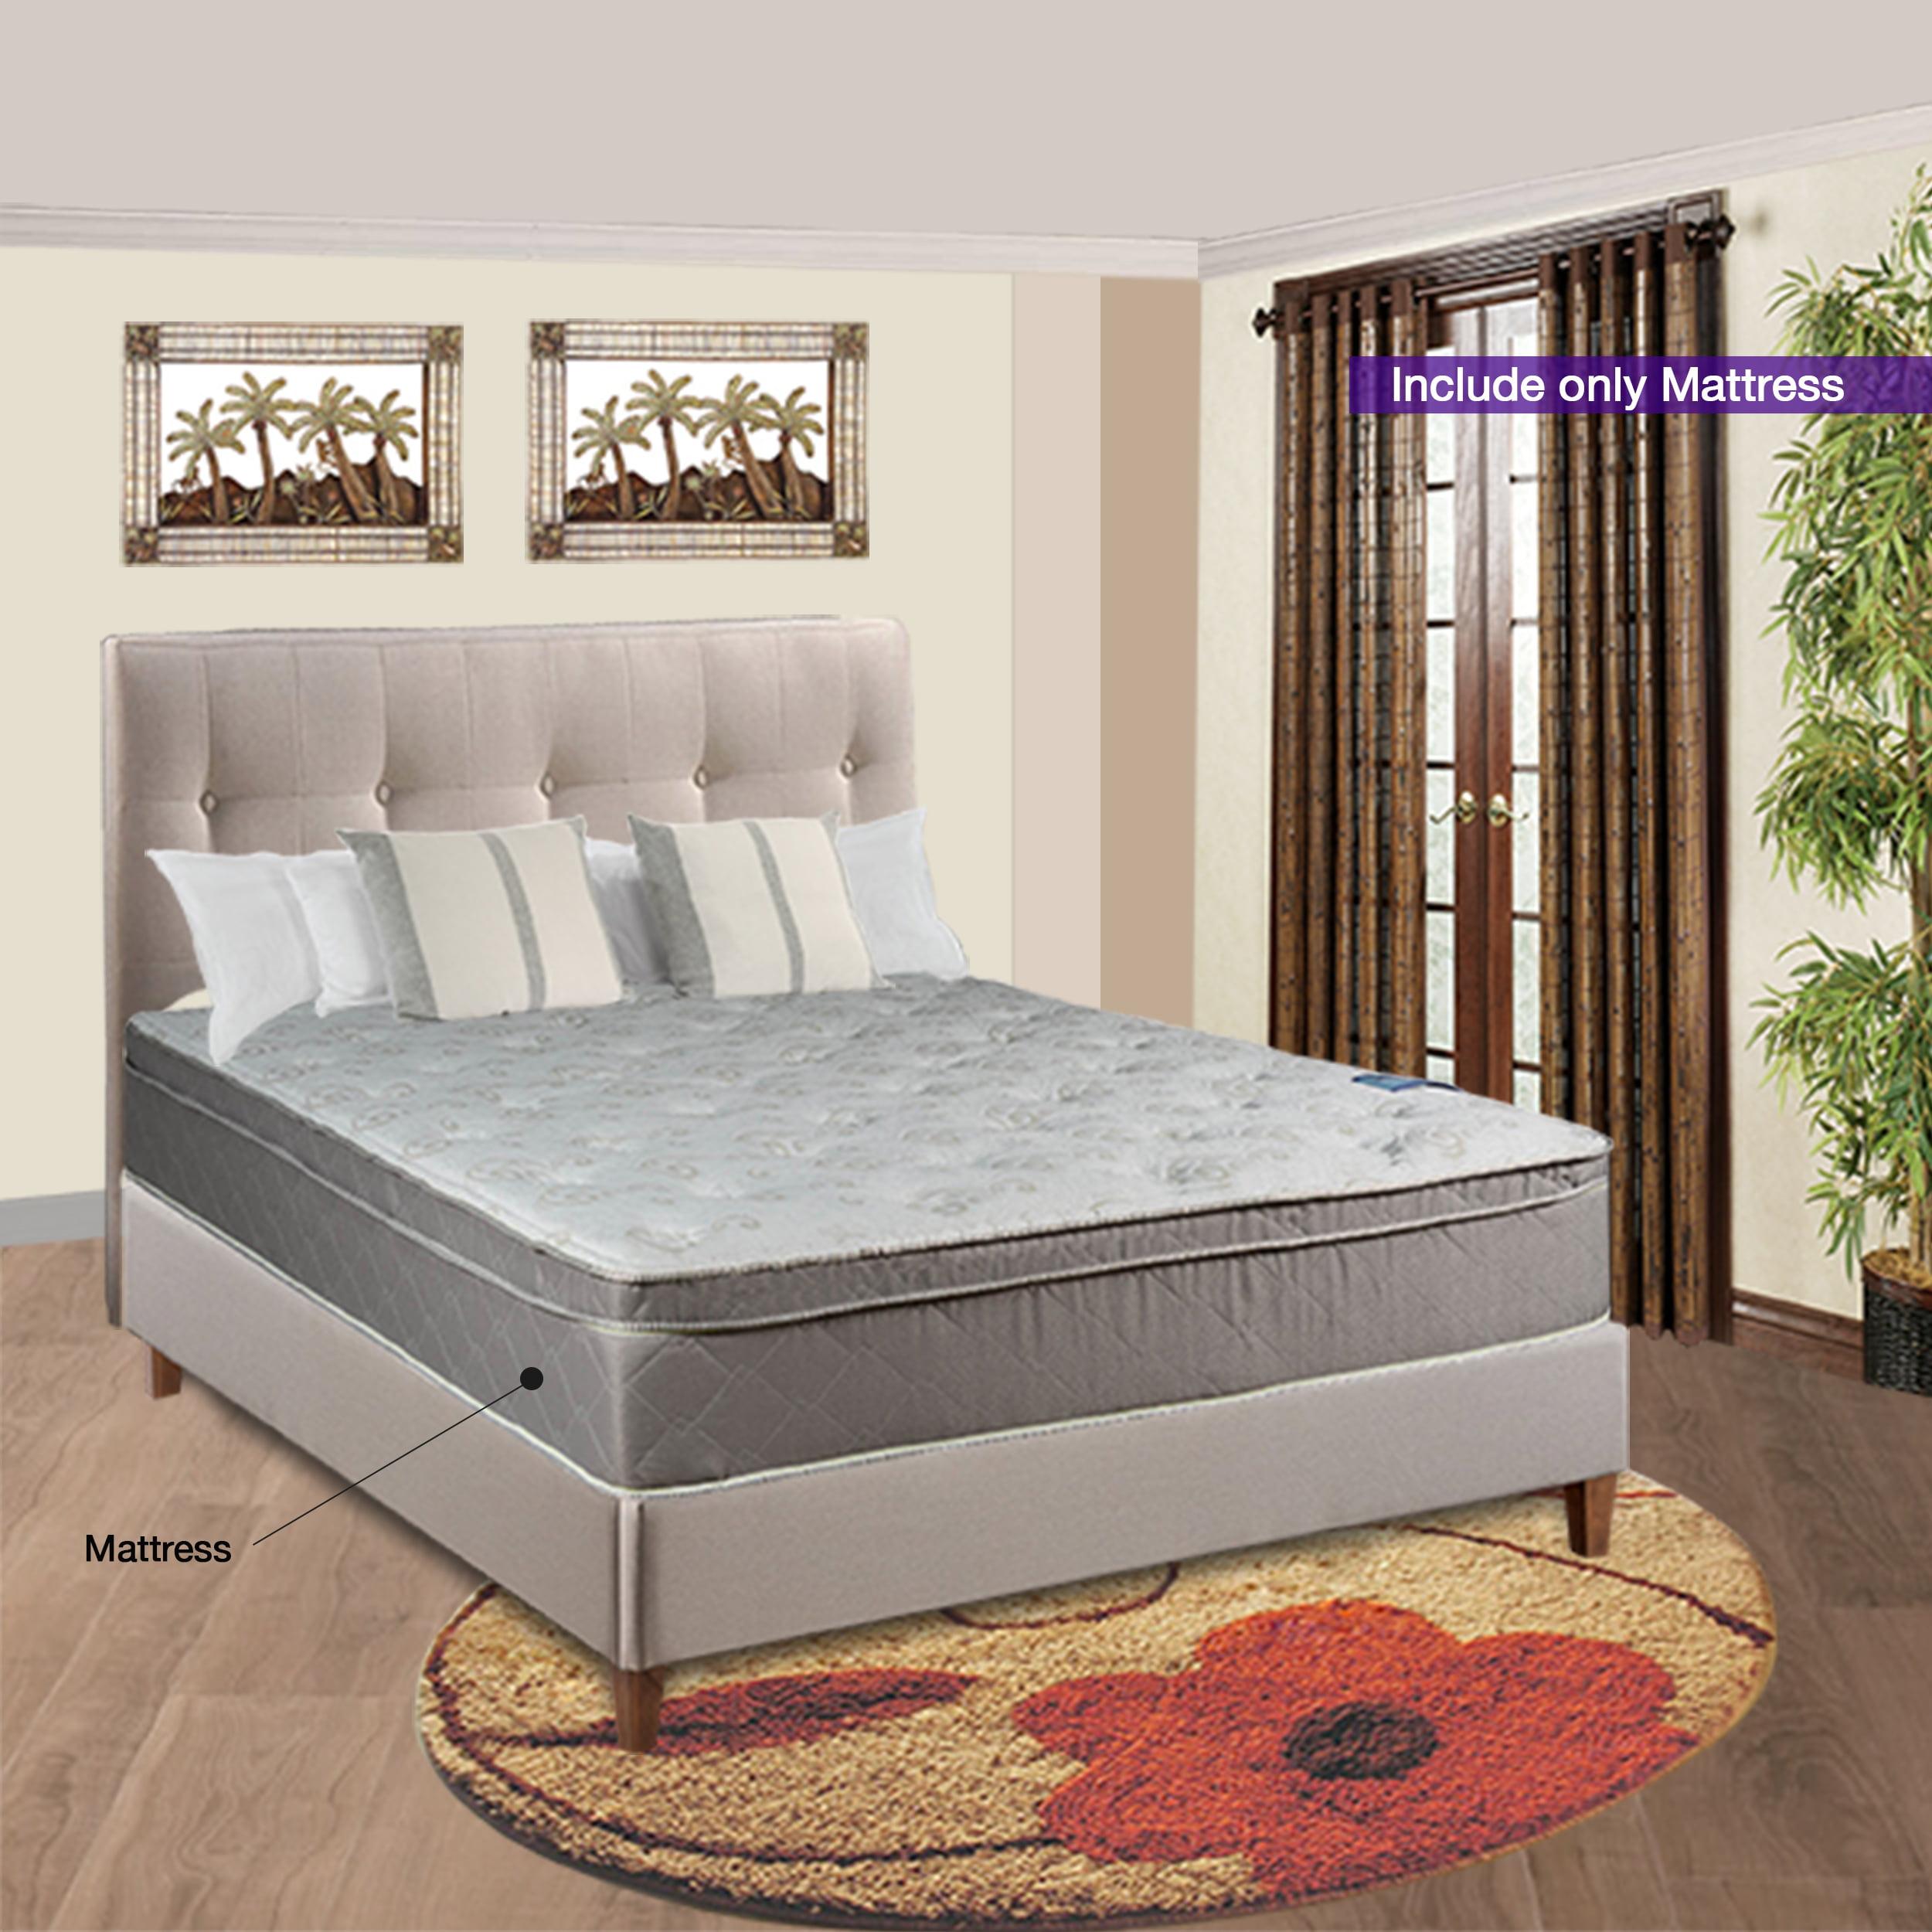 "Continental Sleep, 10"" Fully Assembled Pillow Top Eurotop FOAM ENCASED Medium Plush Innerspring Mattress, Twin Size"